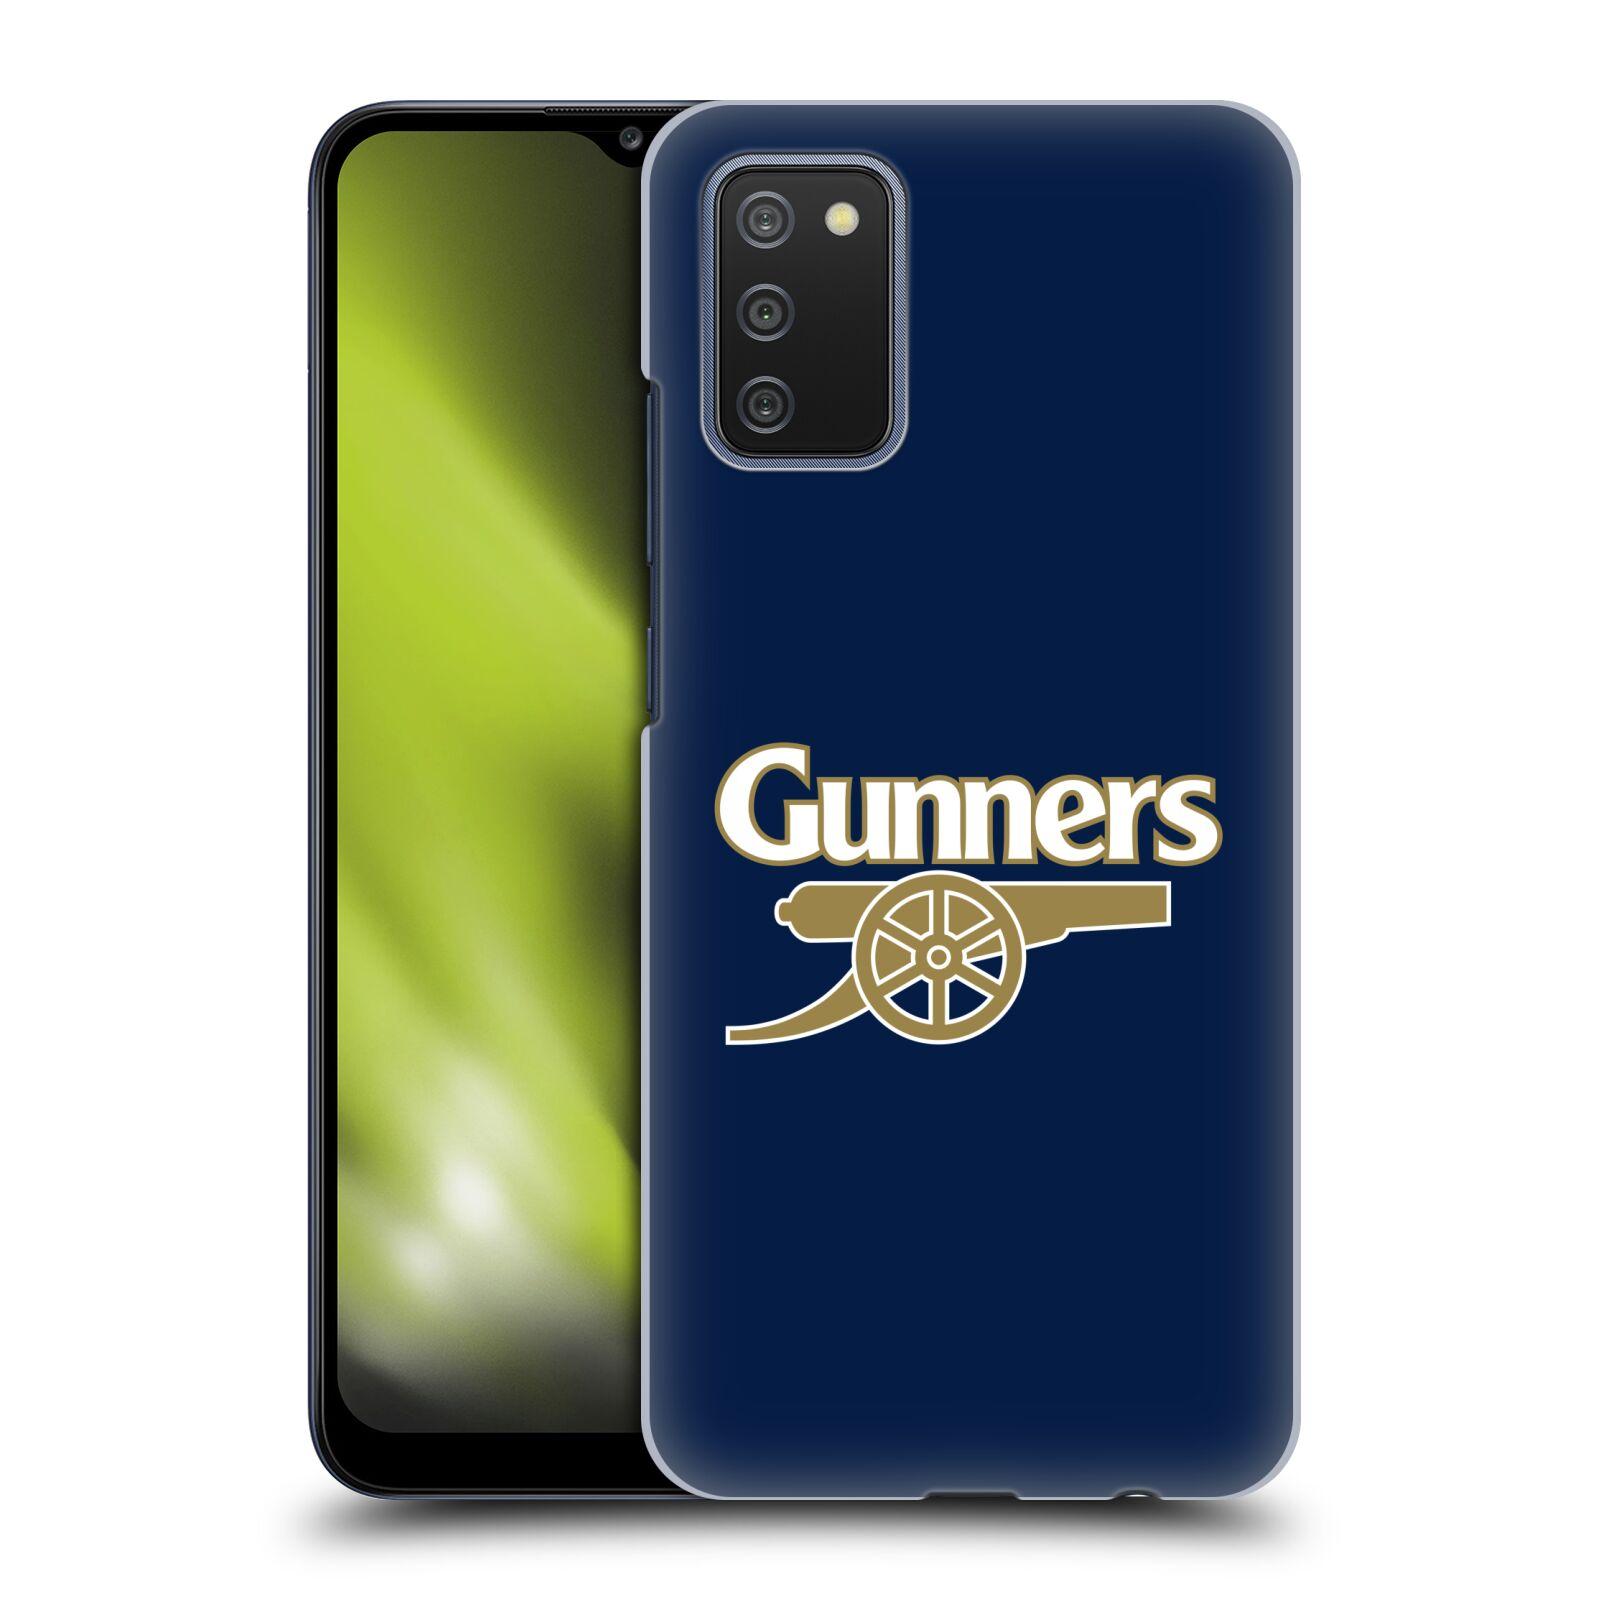 Plastové pouzdro na mobil Samsung Galaxy A02s - Head Case - Arsenal FC - Gunners